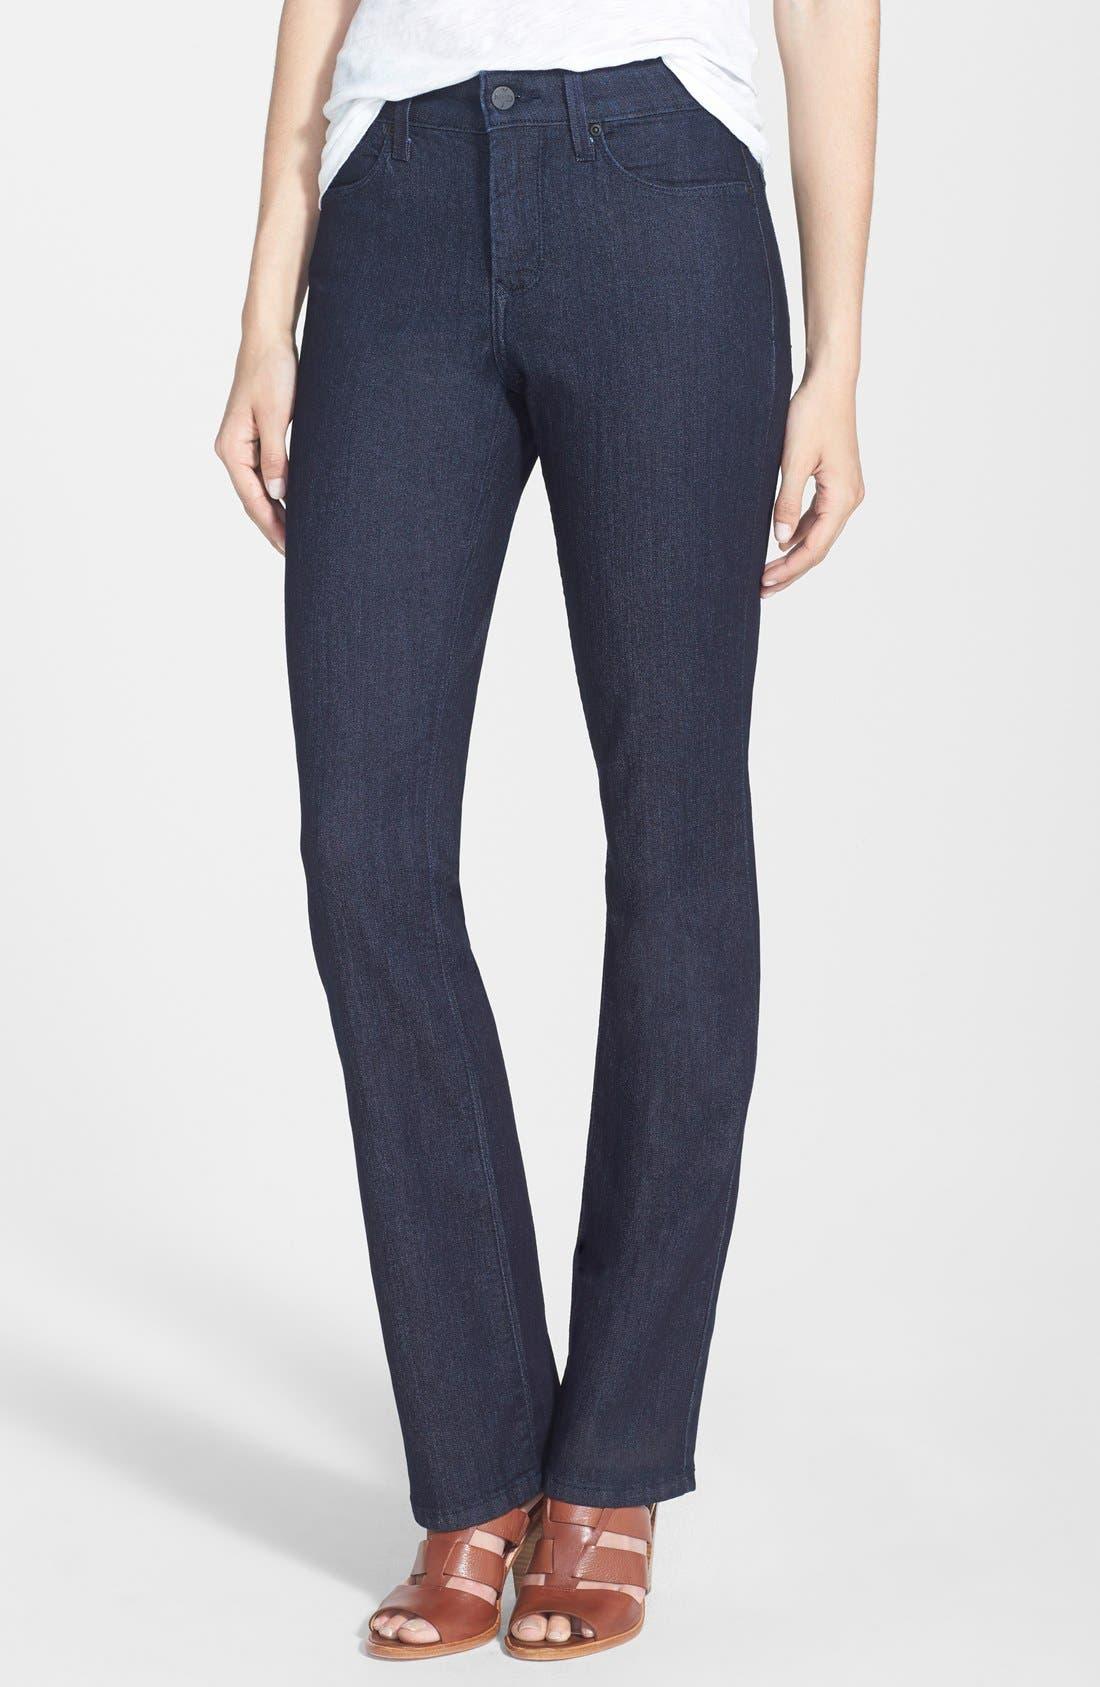 NYDJ 'Billie' Stretch Mini Bootcut Jeans (Dark Enzyme) (Regular & Petite)